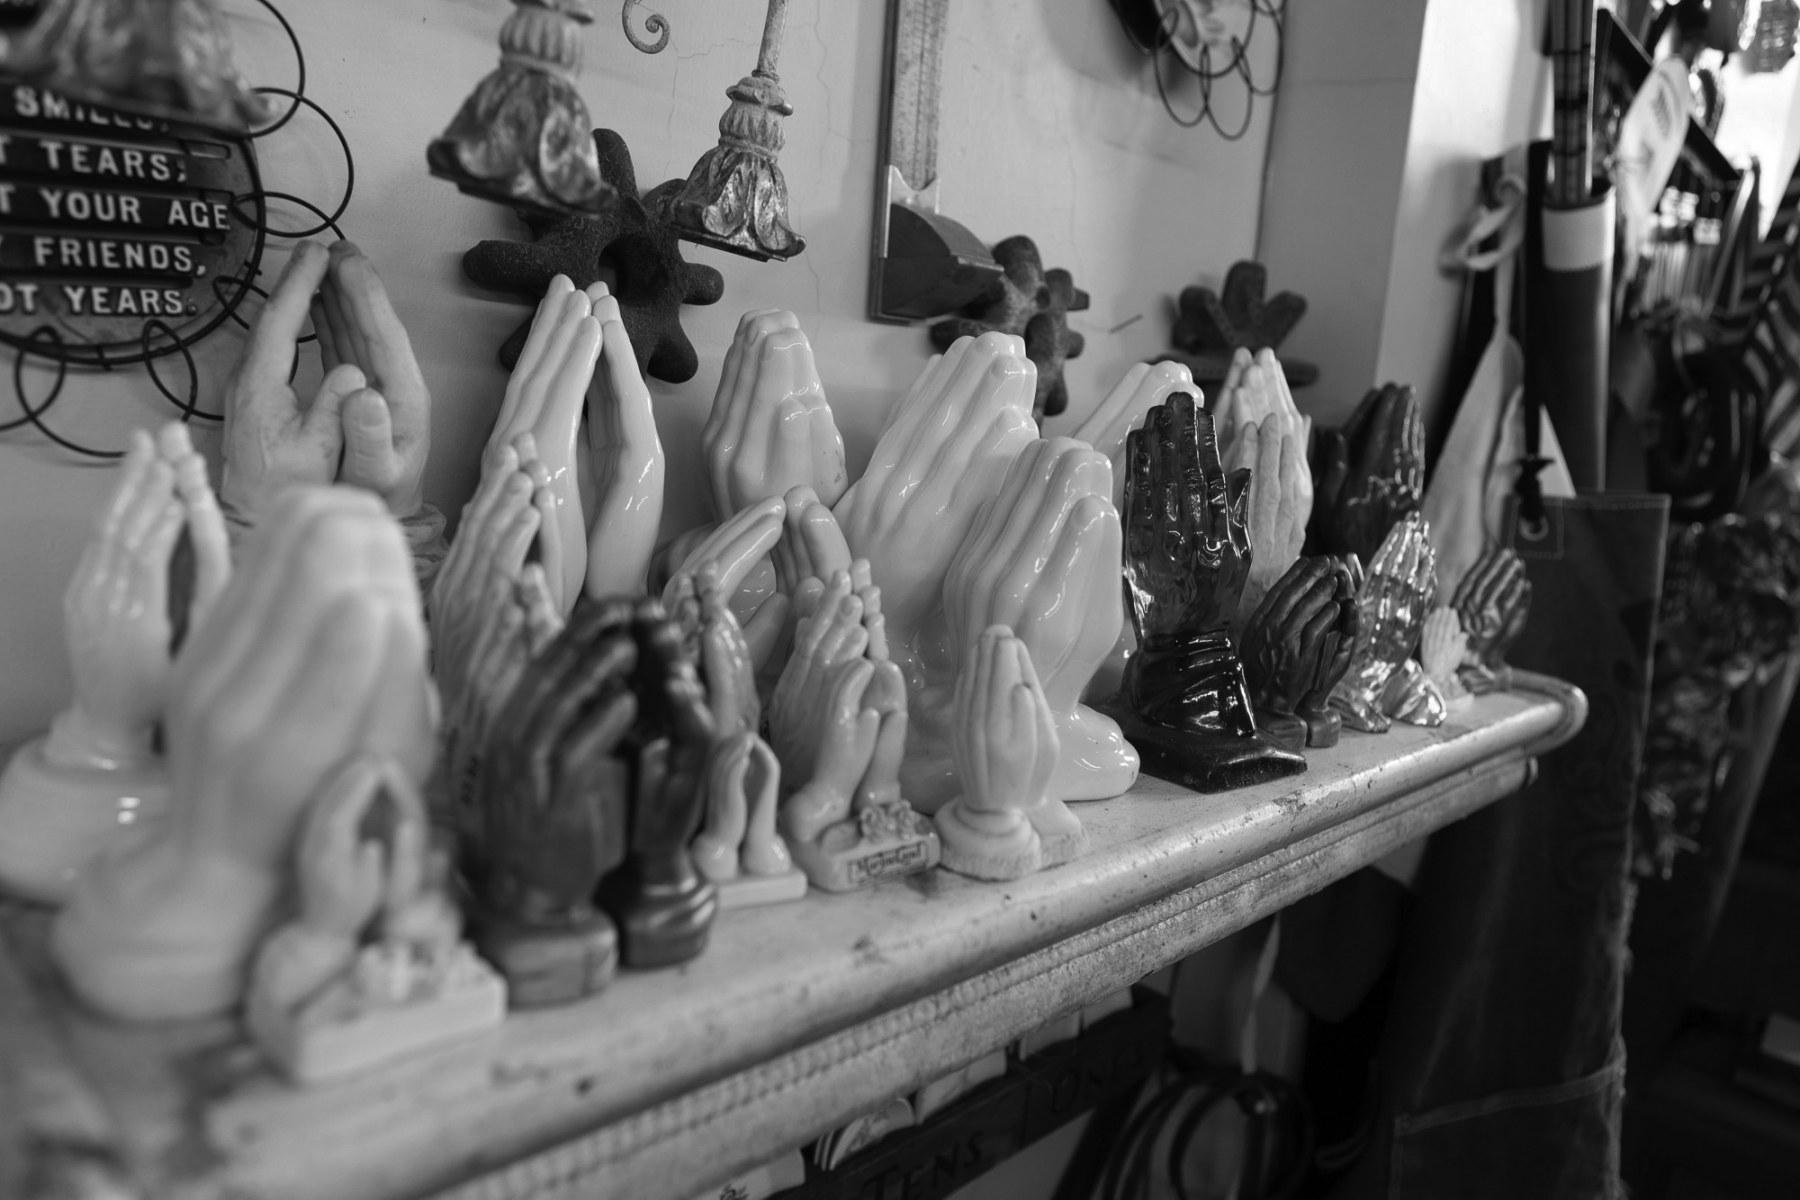 JP-CK-studio-praying-hands-shelf